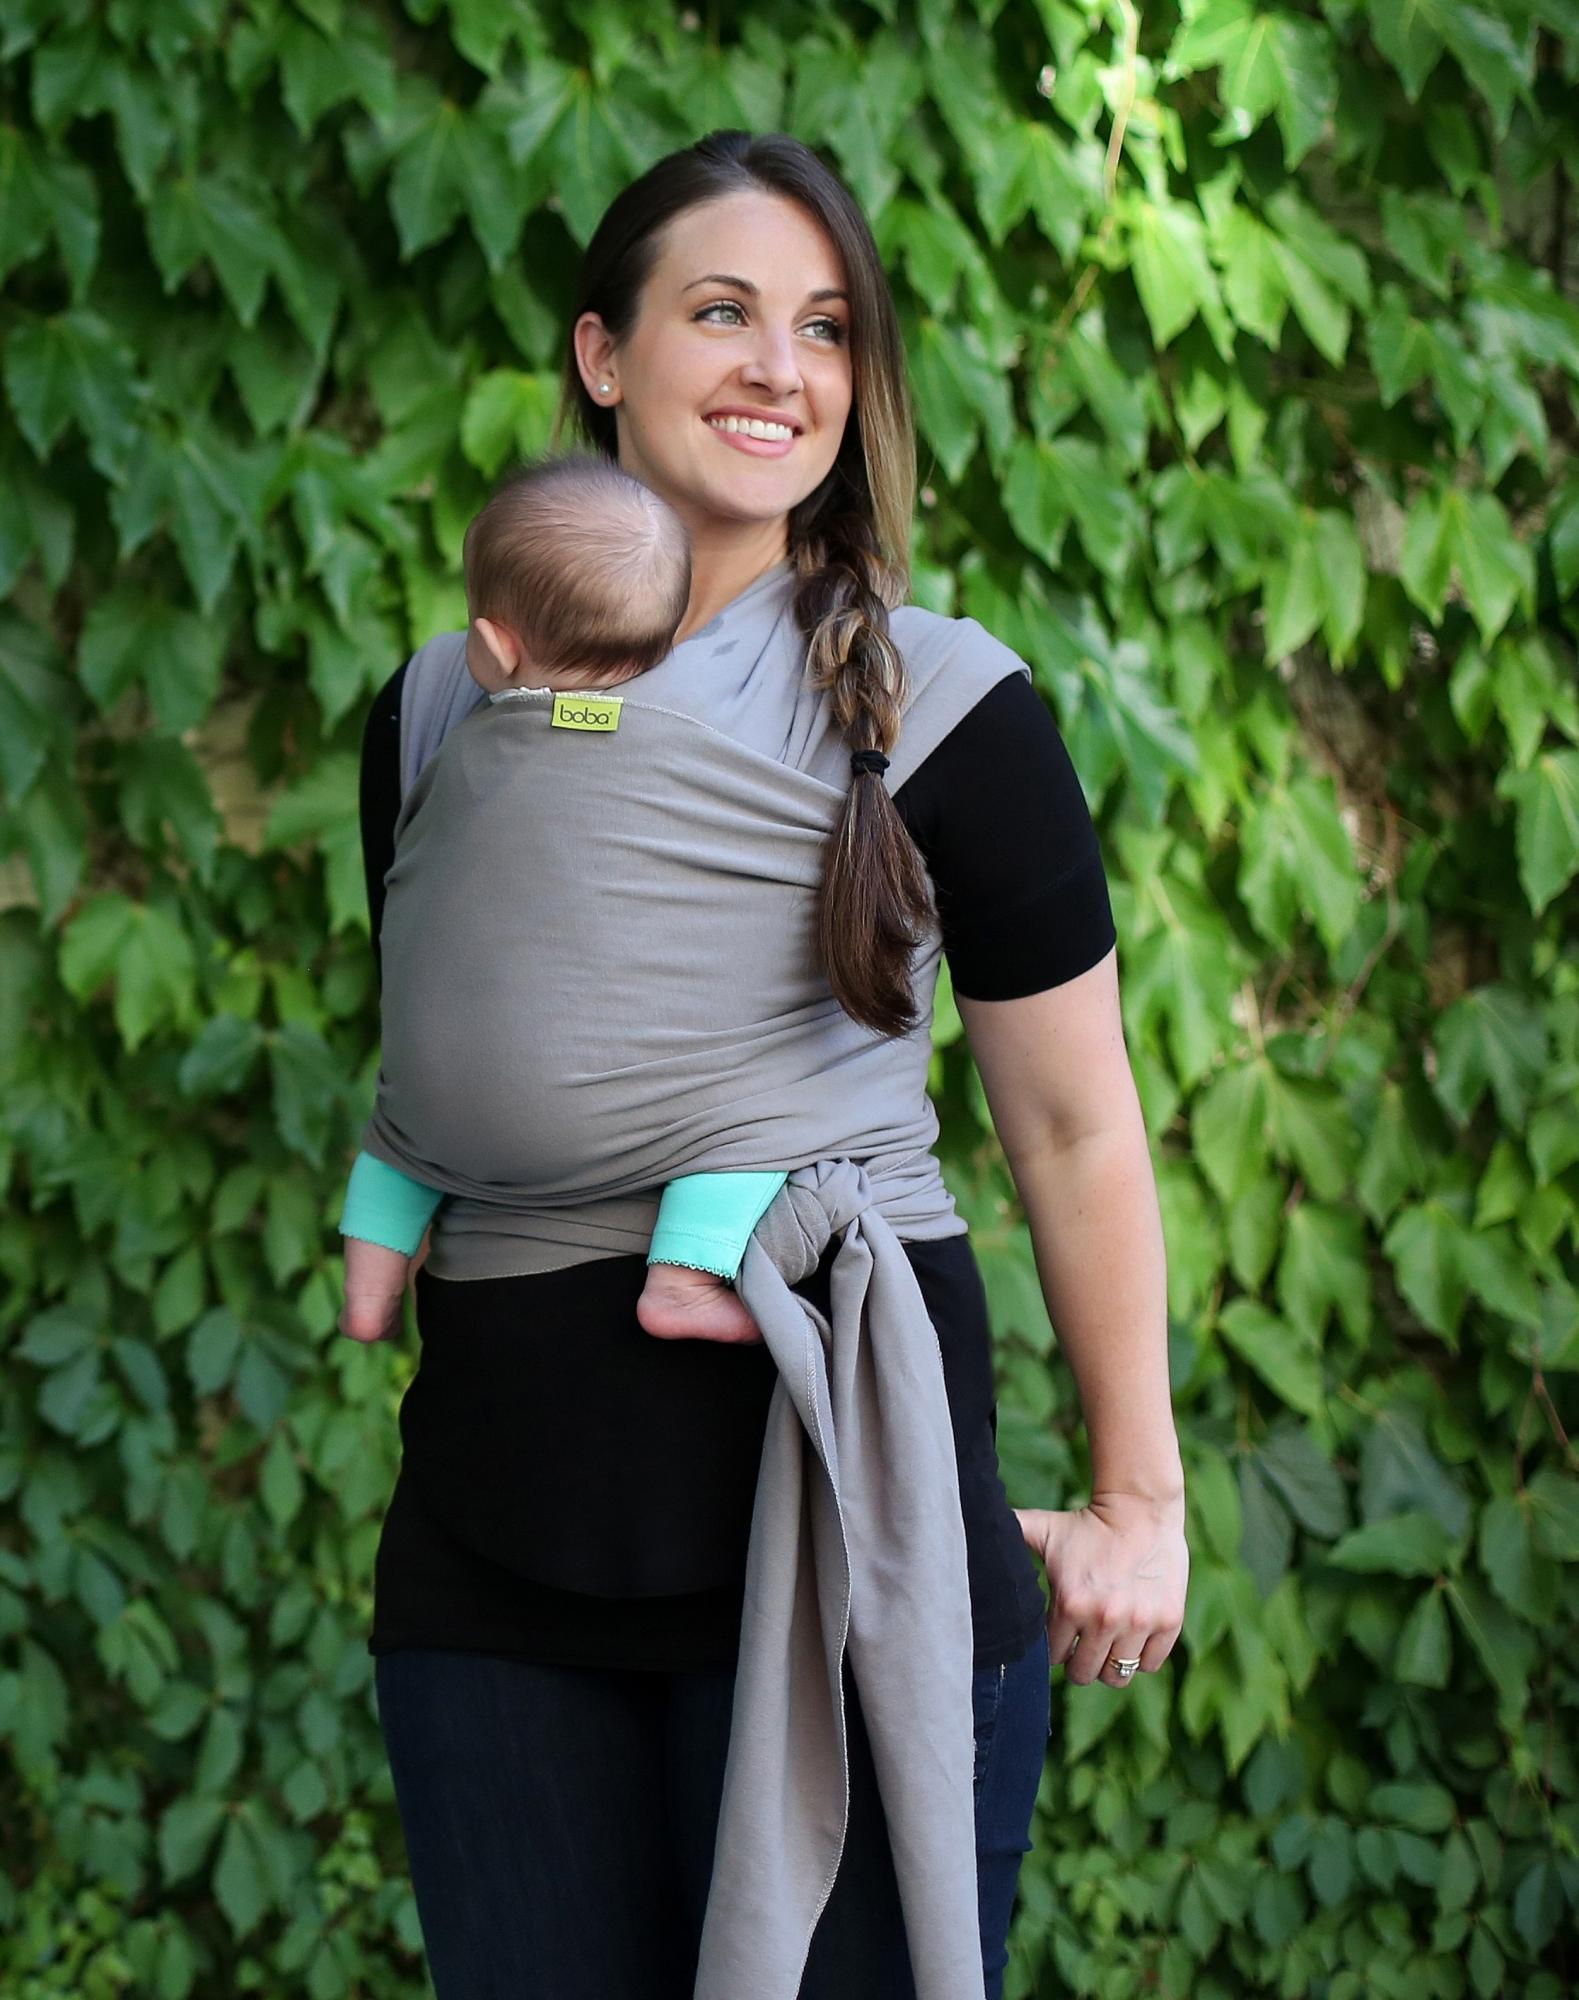 boba-wrap-baby-carrier-grey.jpg